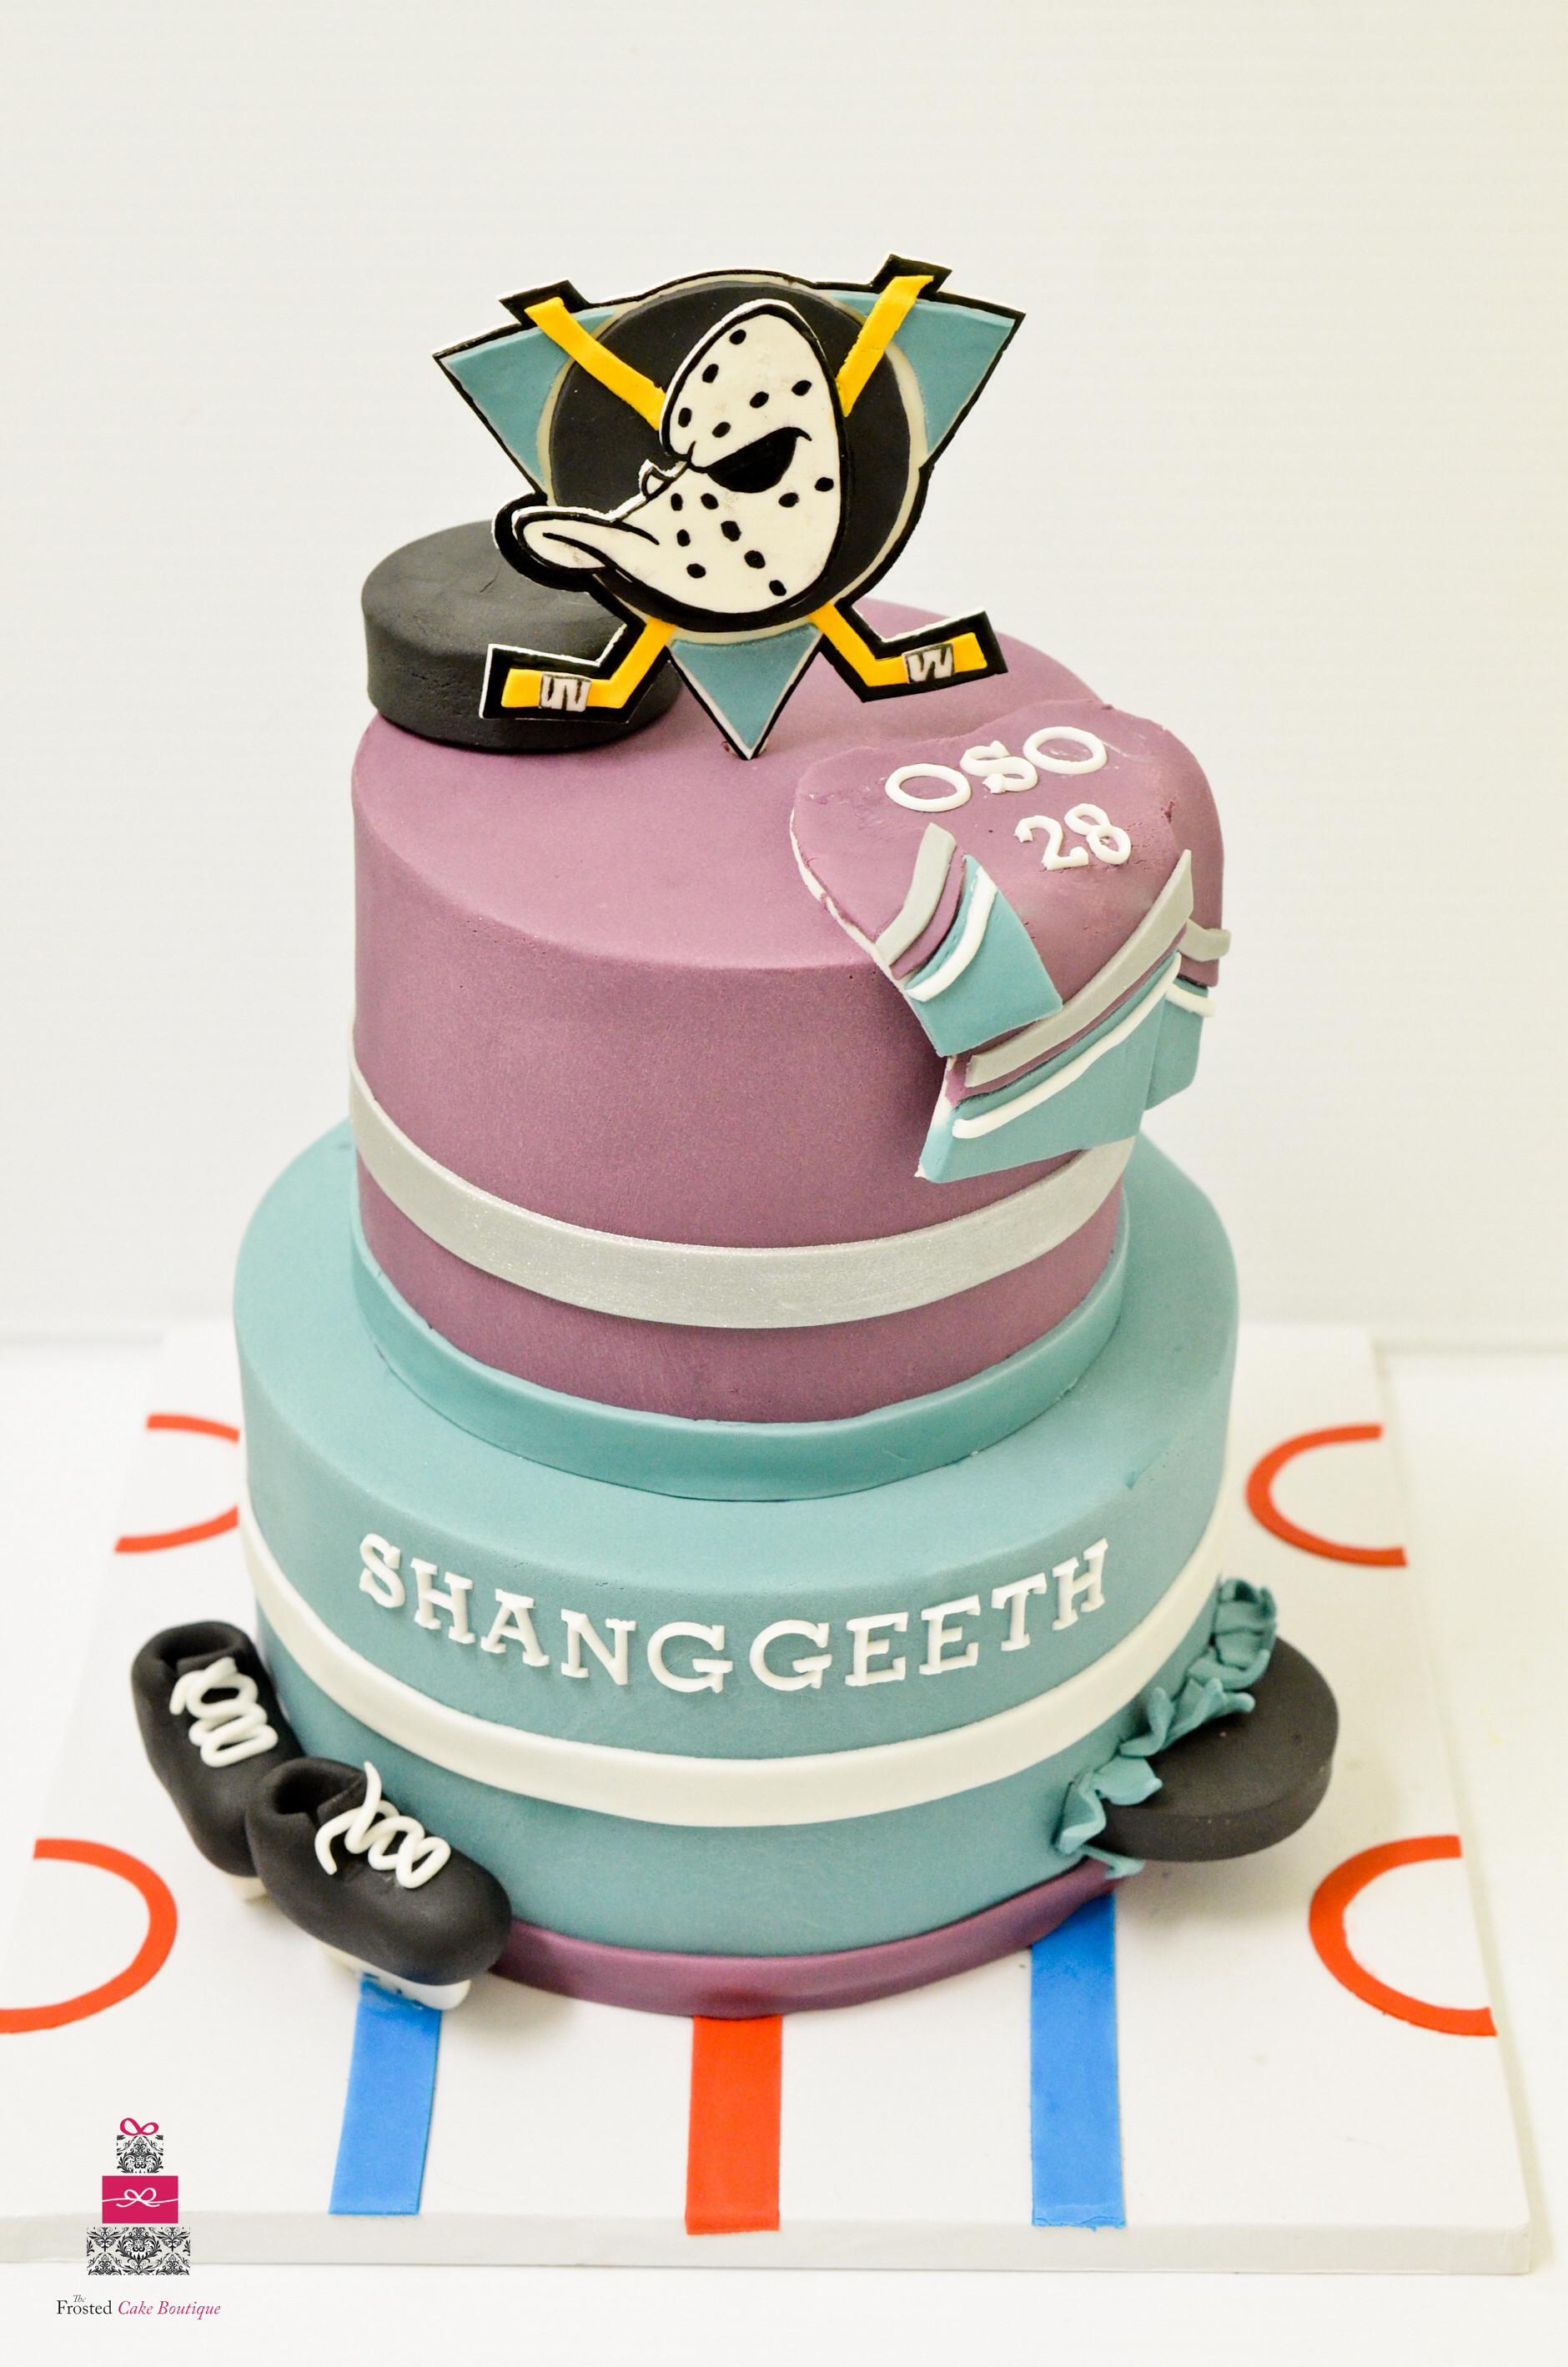 Anaheim Ducks Birthday Cake